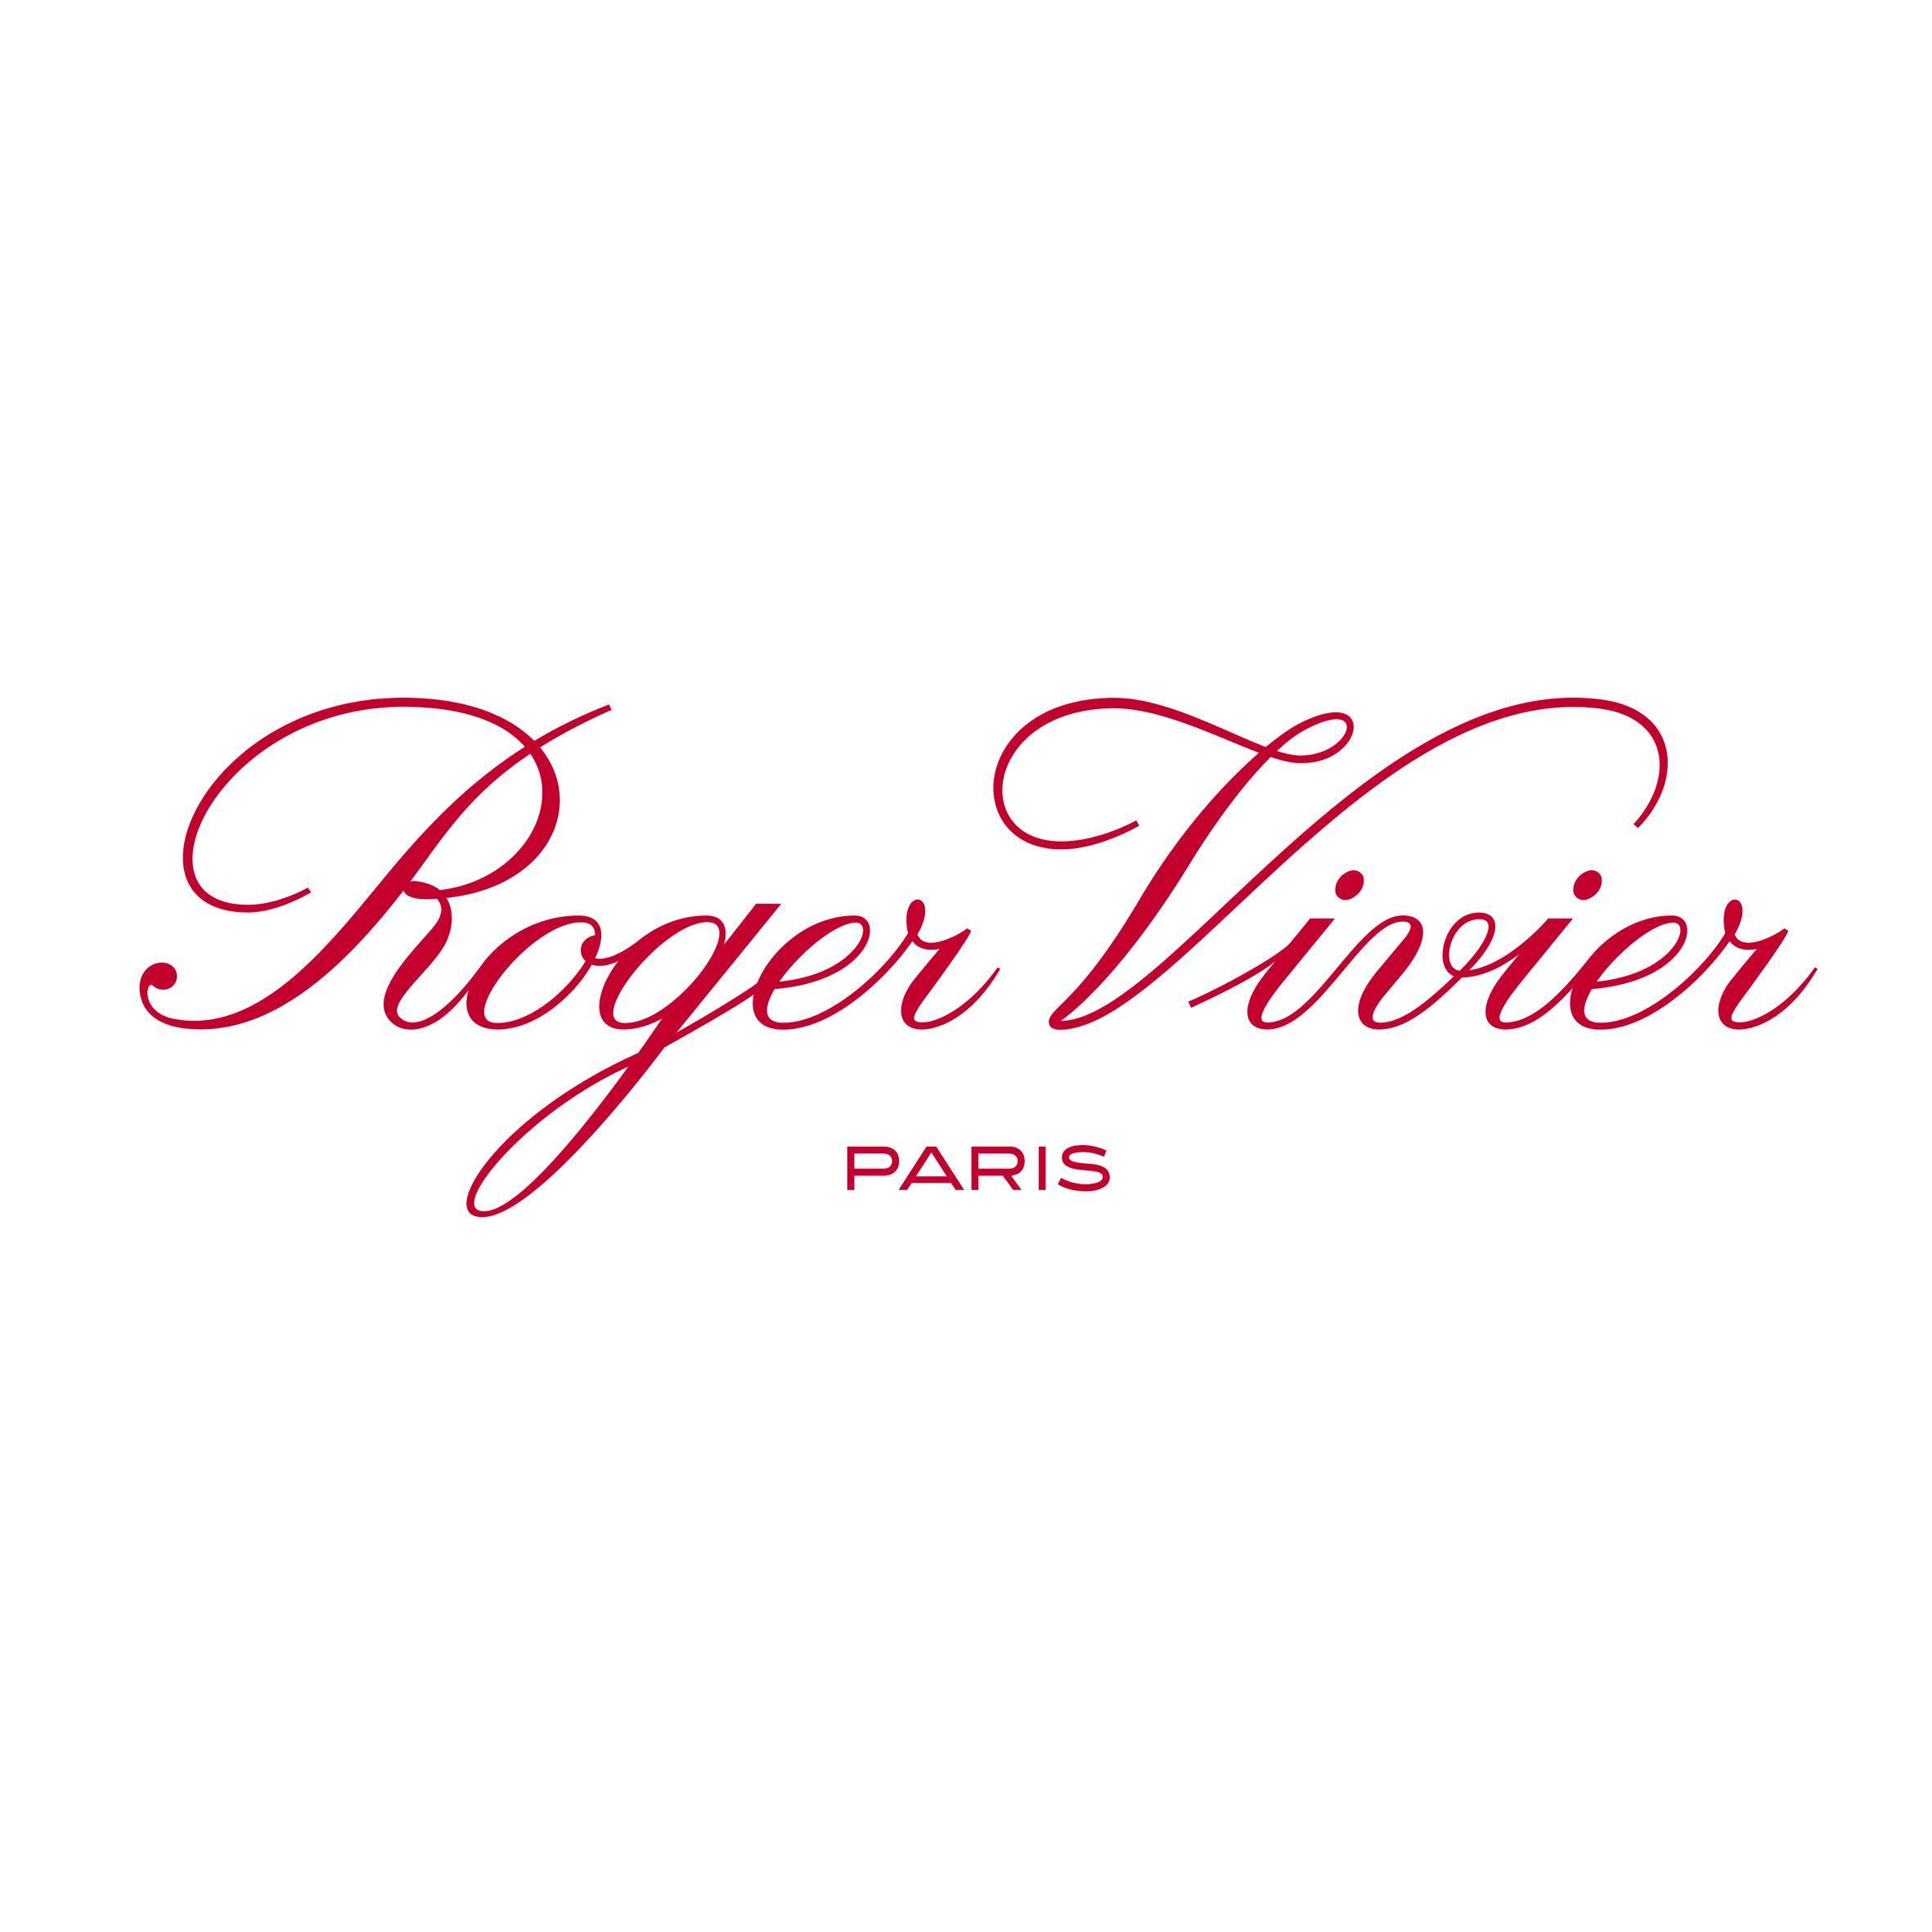 Hotel-griffato-Roger-Vivier.jpeg